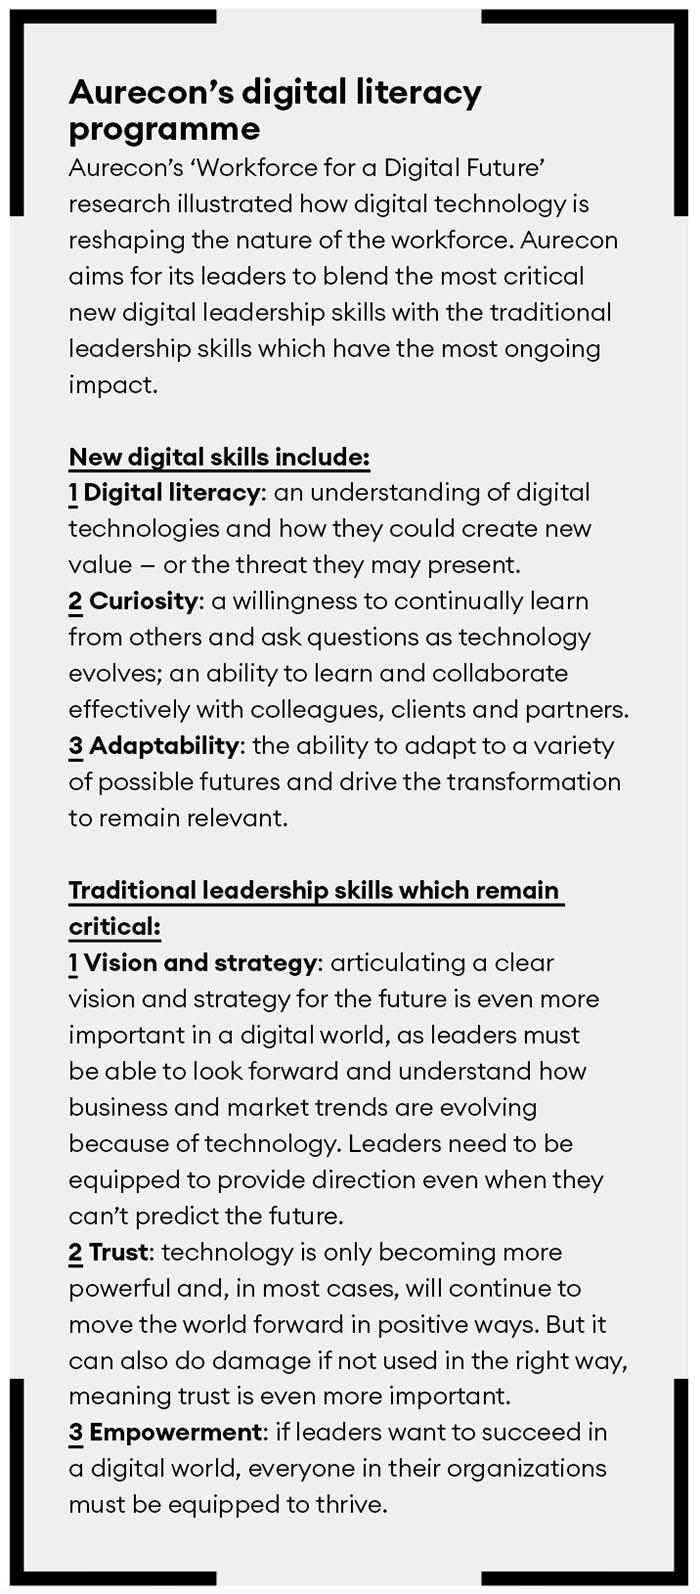 Aurecon's digital literacy program